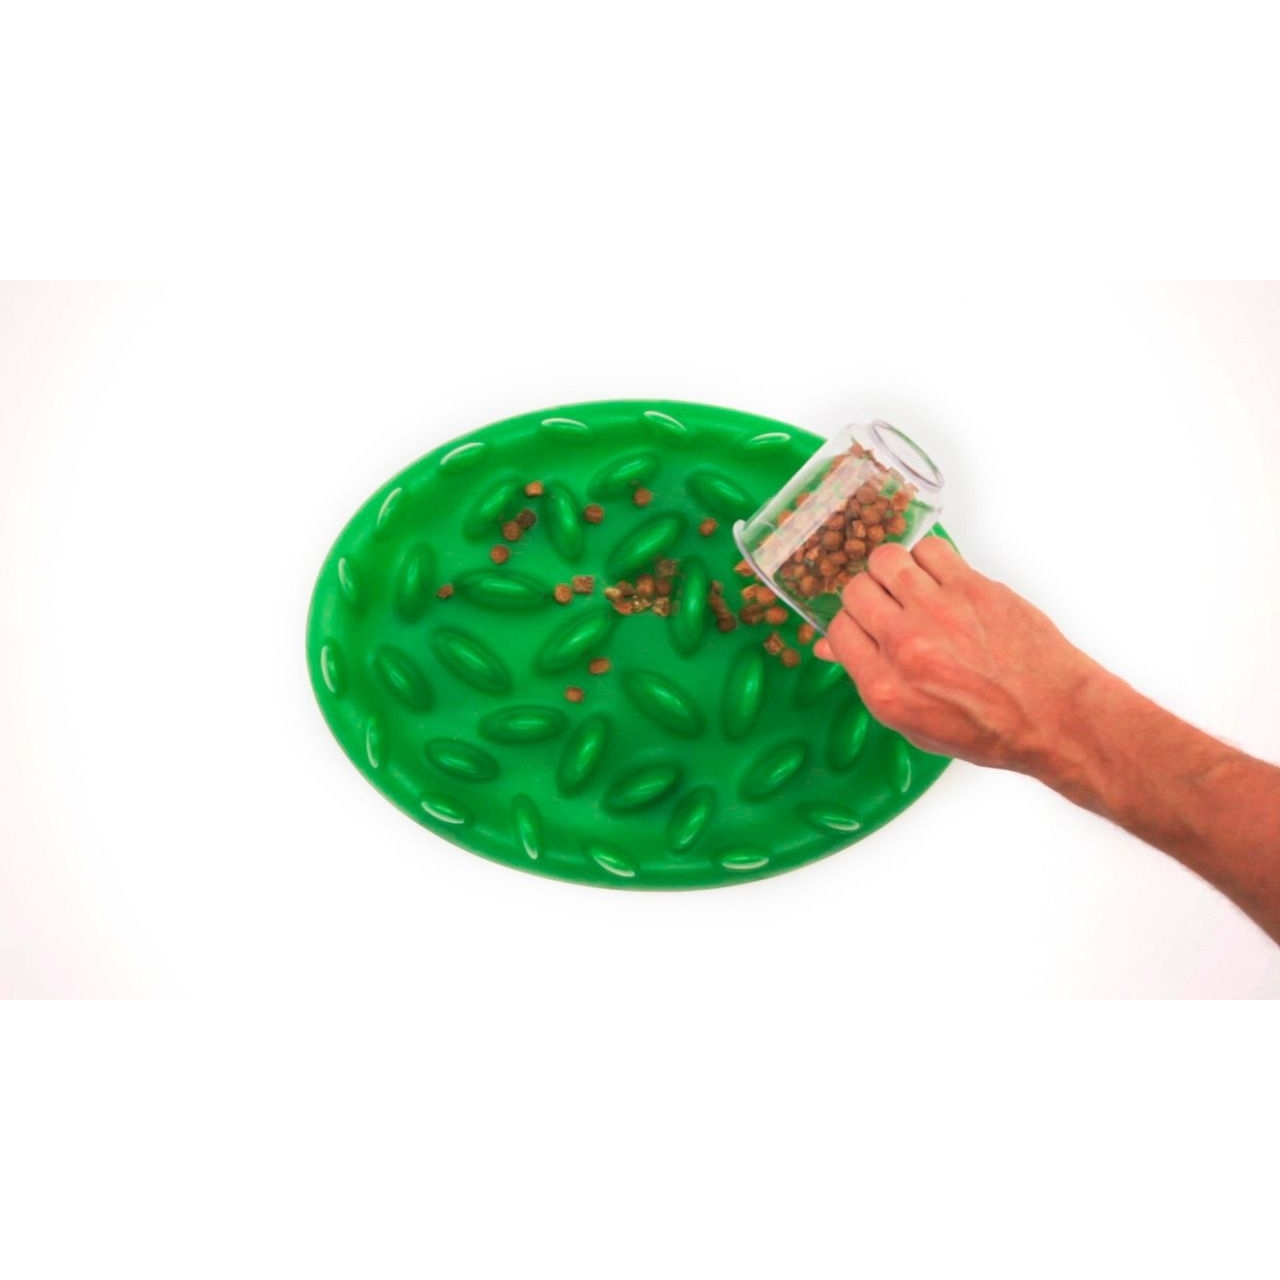 Northmate Green Mini Hundenapf, Bild 2